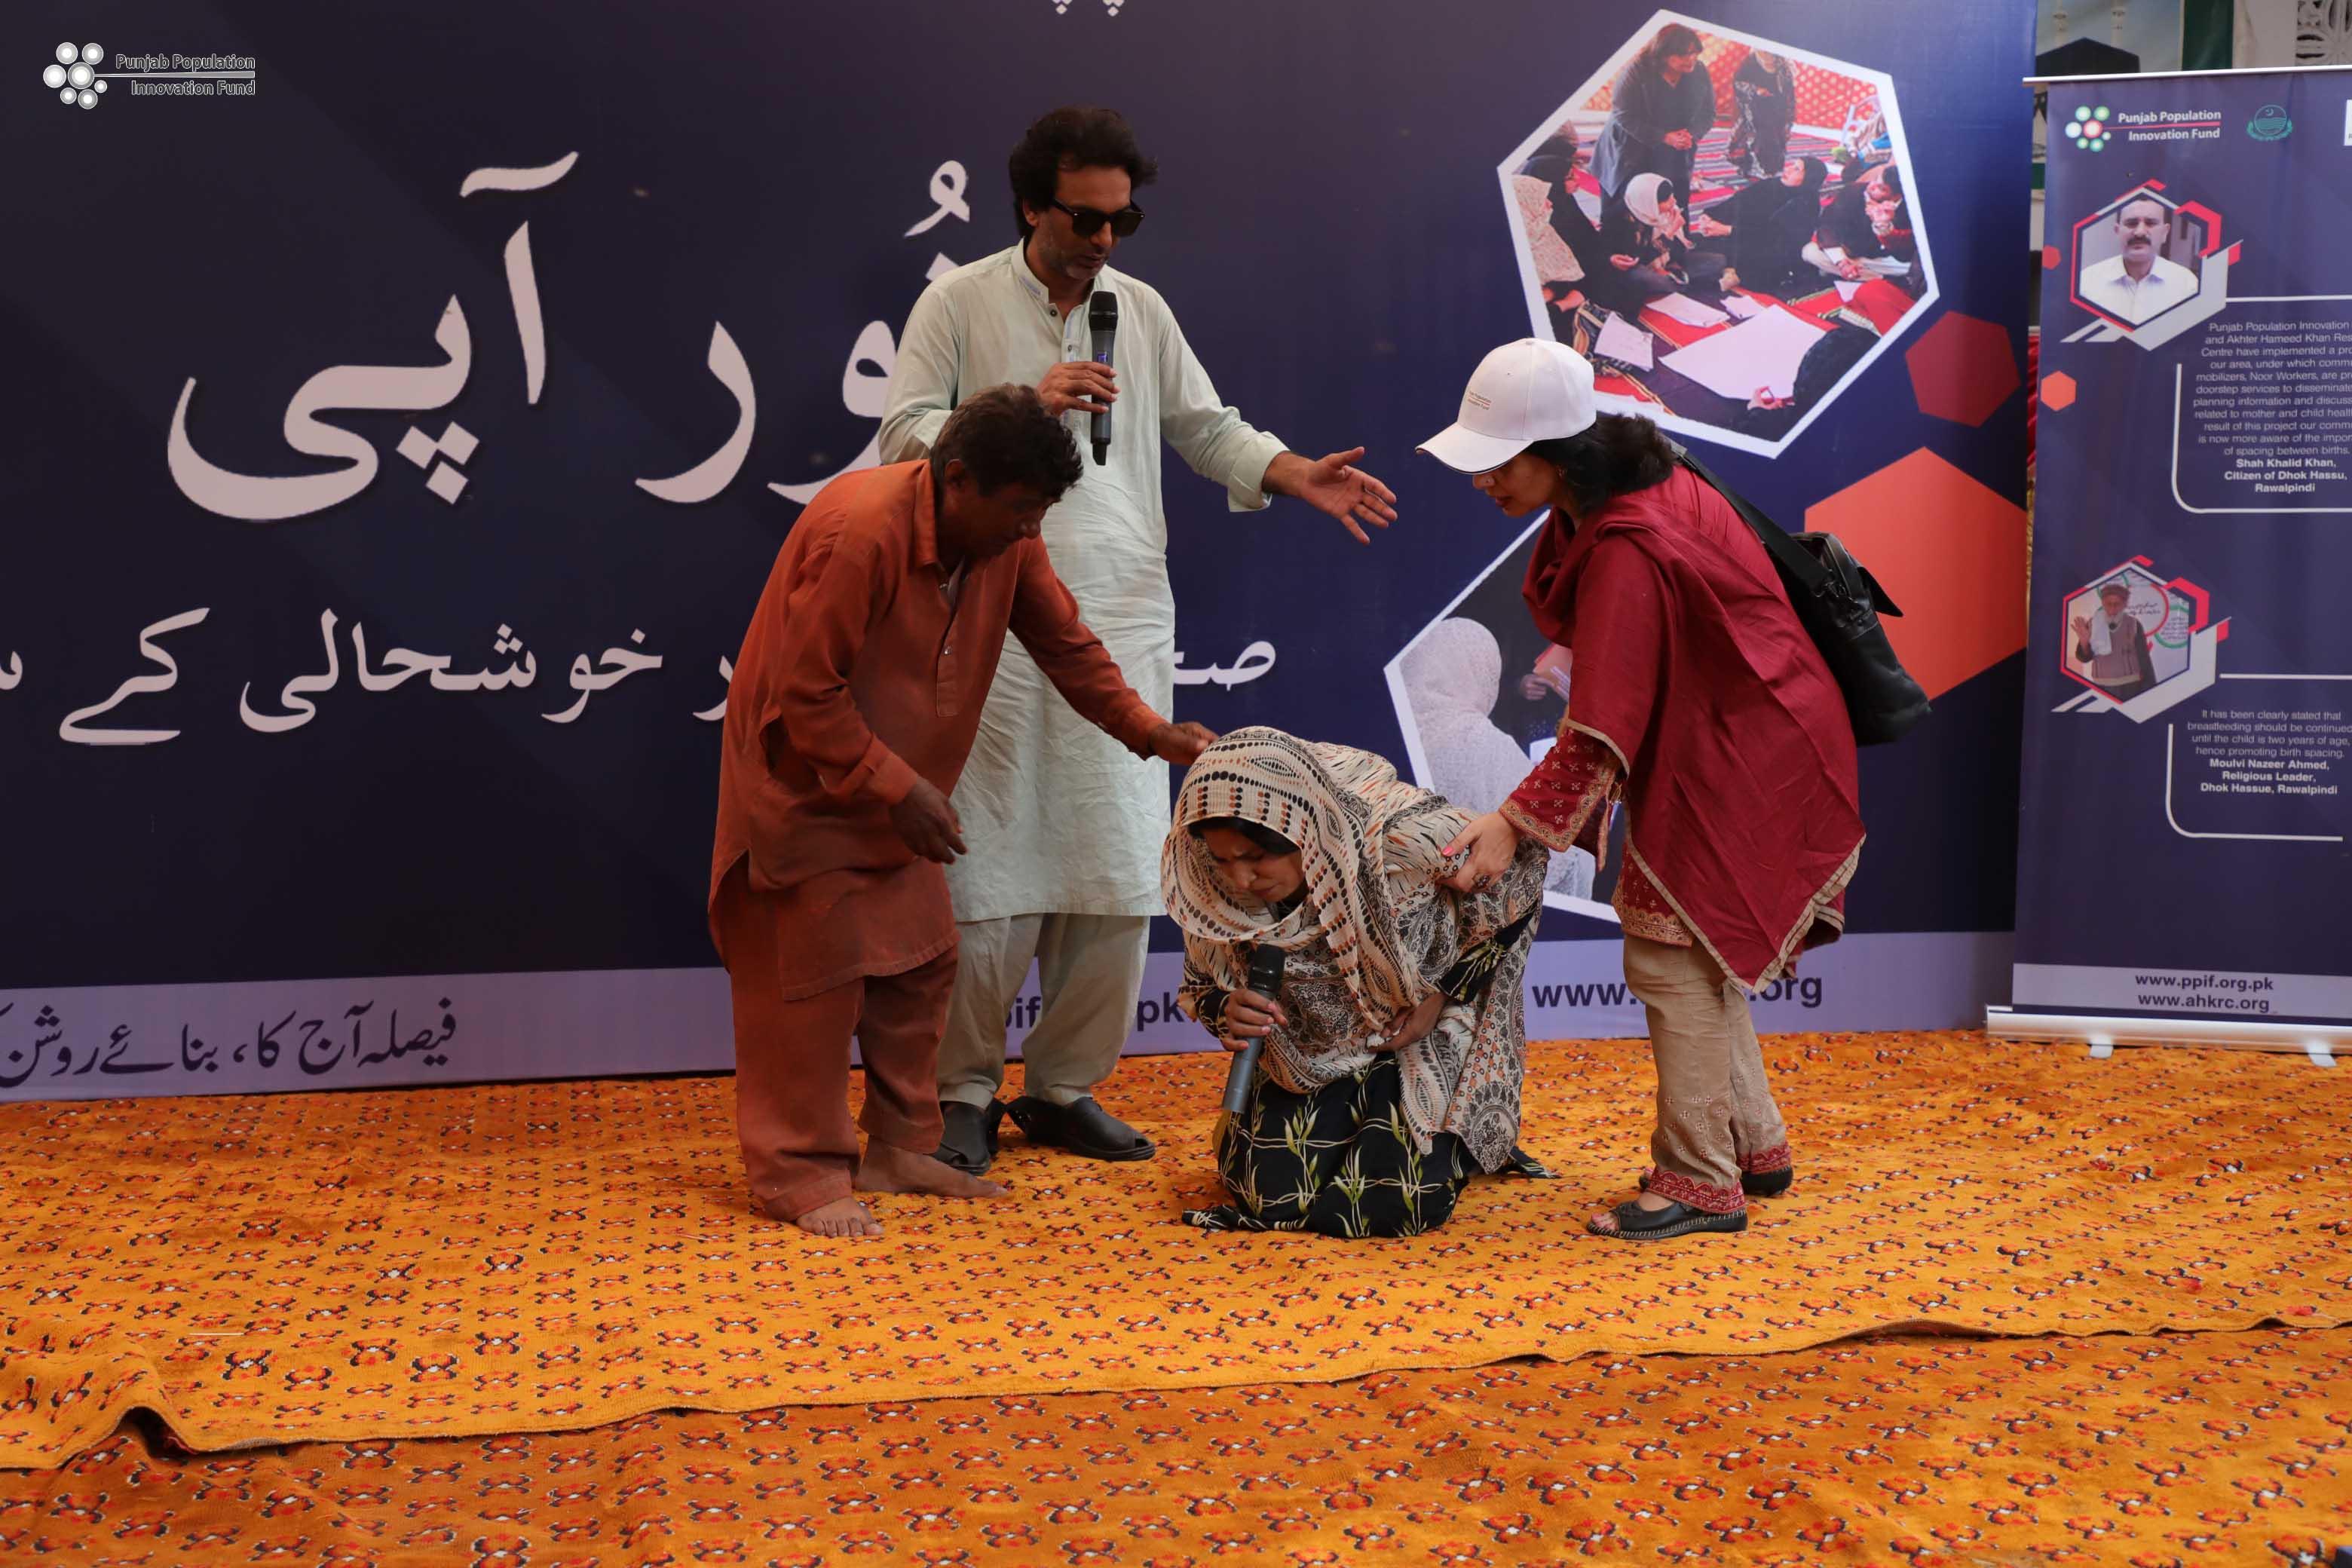 PPIF Events - Punjab Population Innovation Fund (PPIF)